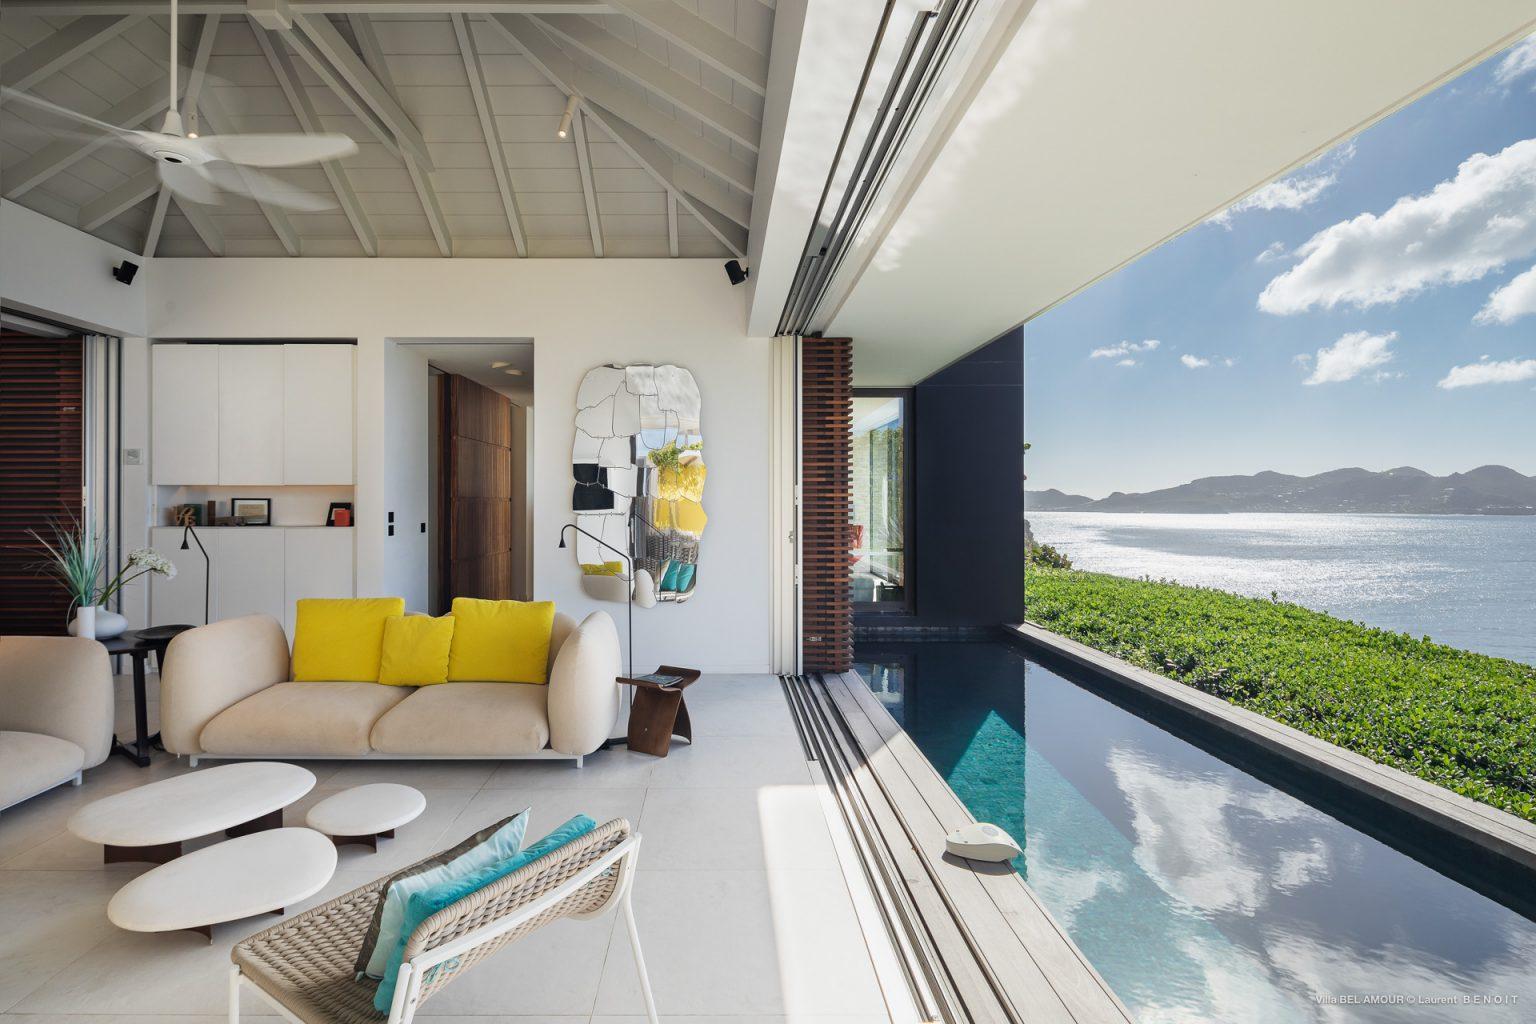 Villa Belamour - Cosy Villa Rental St Barth Sea view - Living room and Swimming pool